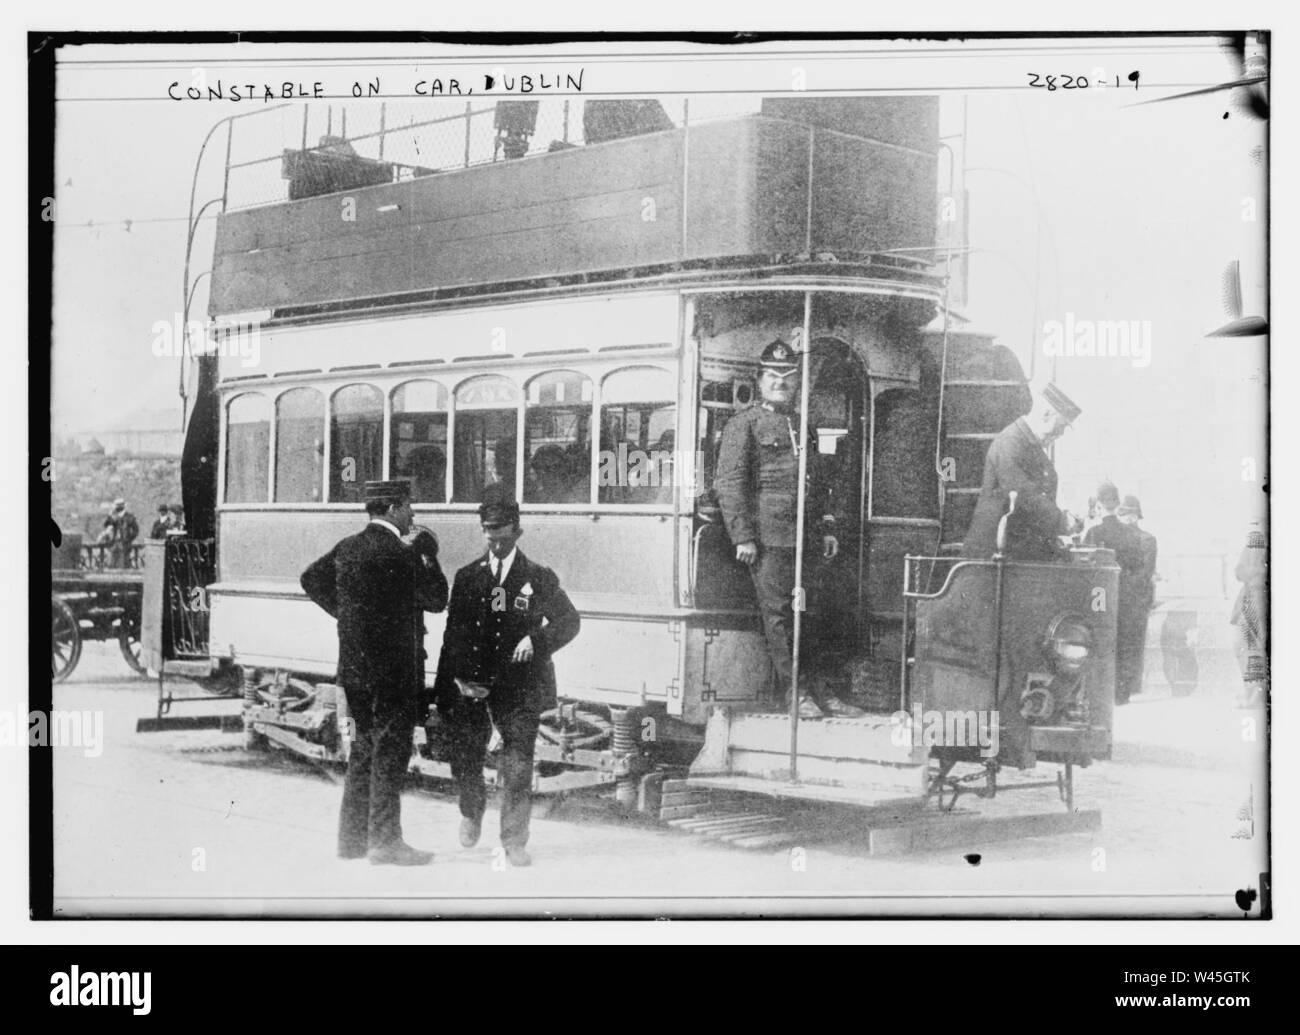 Constable on car - Dublin Stock Photo